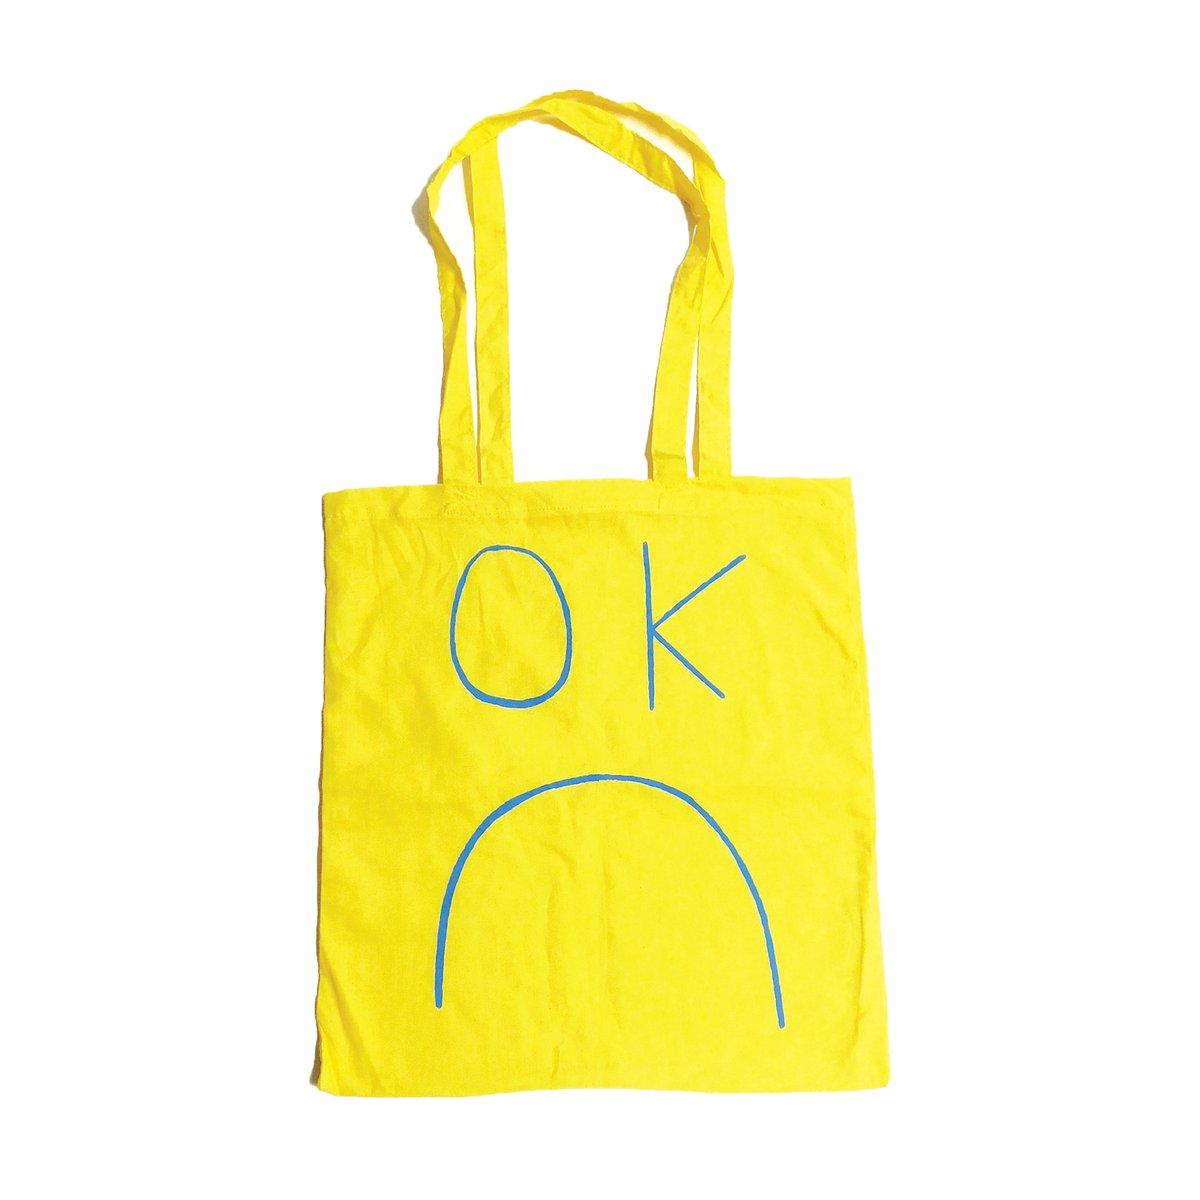 Image of Okay Club Tote Yellow